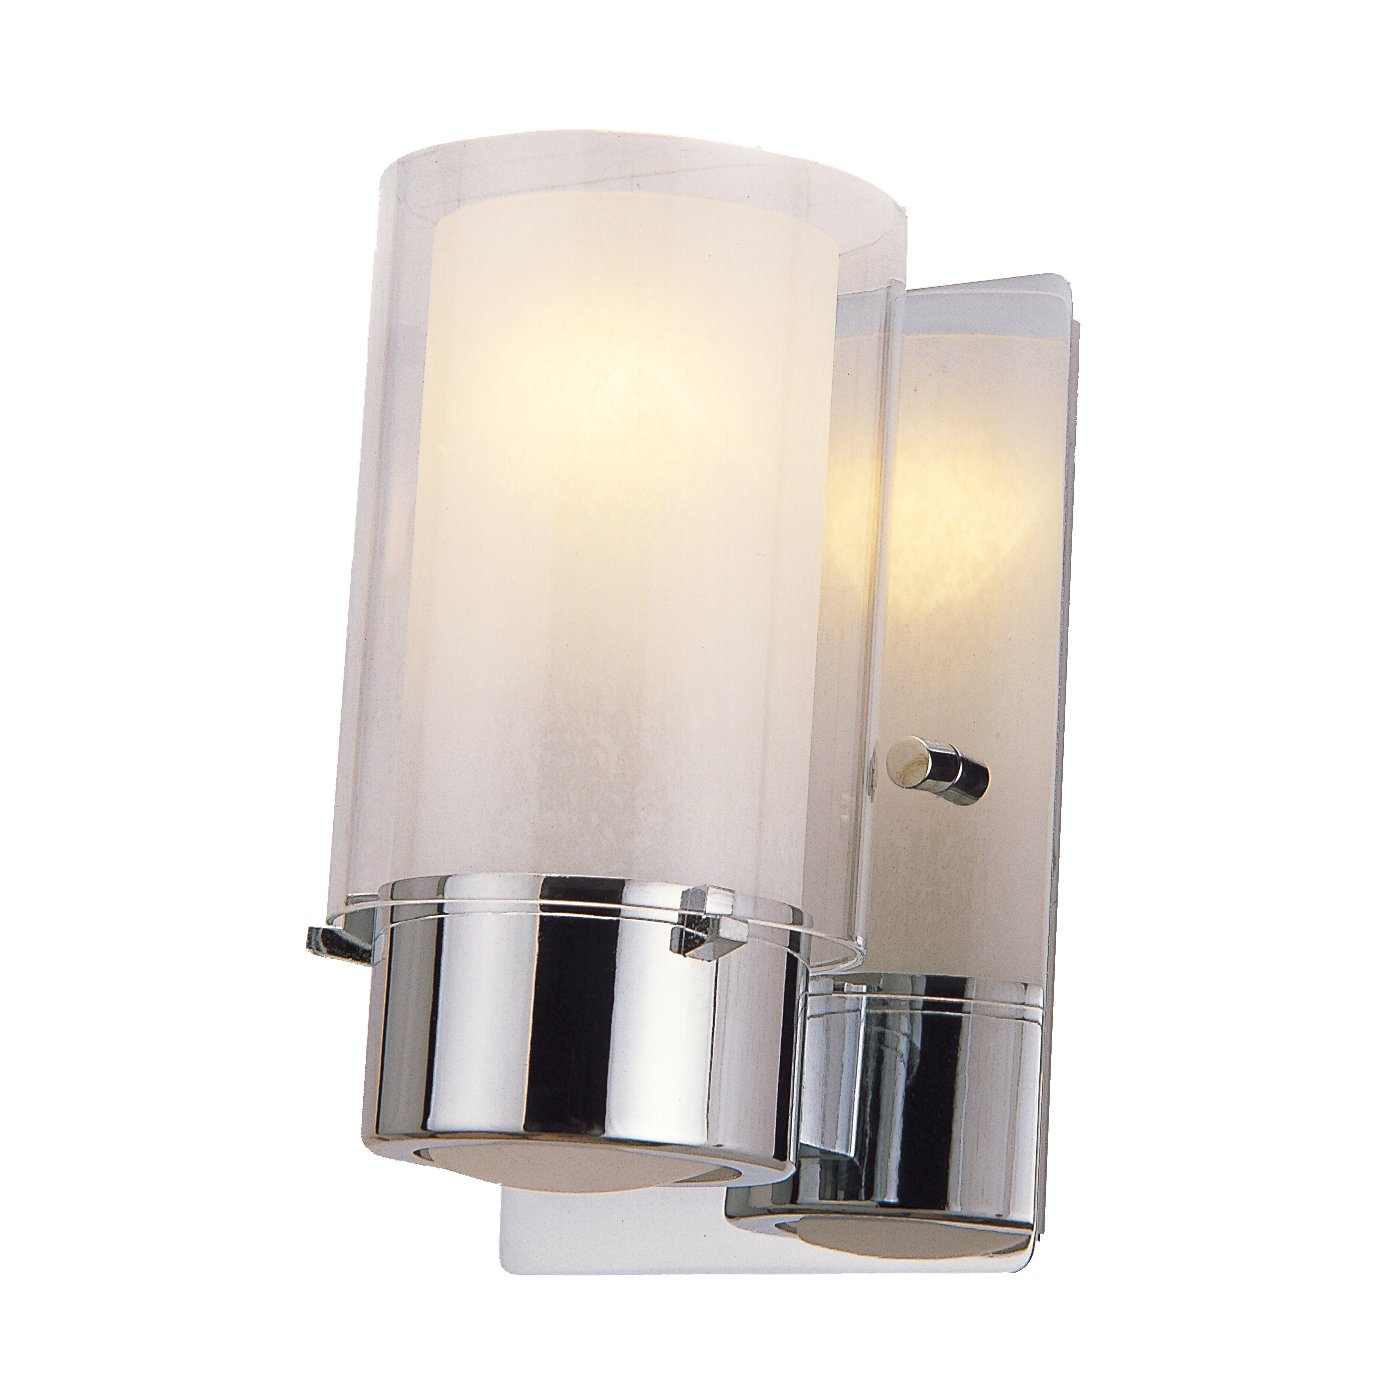 Mad for MidCentury Modern Bathroom Sconces